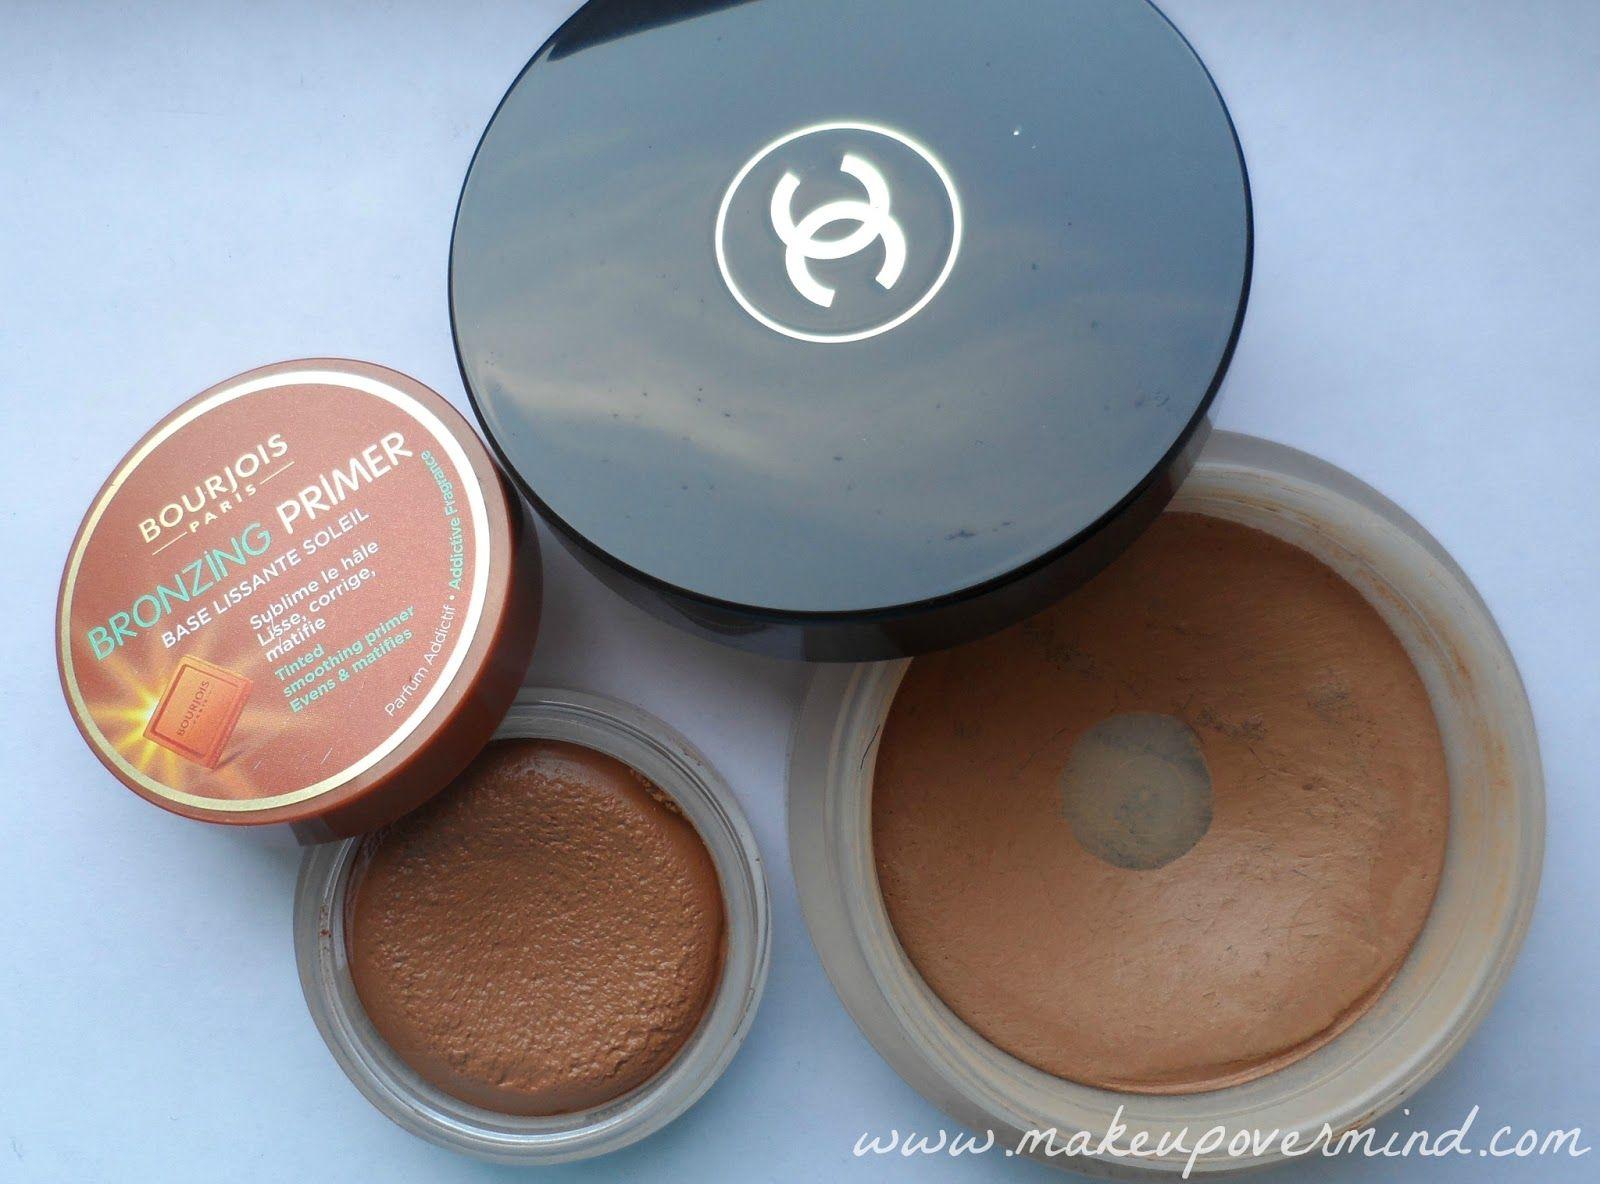 Makeup Over Mind Review Bourjois Bronzing Primer Vs Chanel Soleil Parfum Putri Tan De